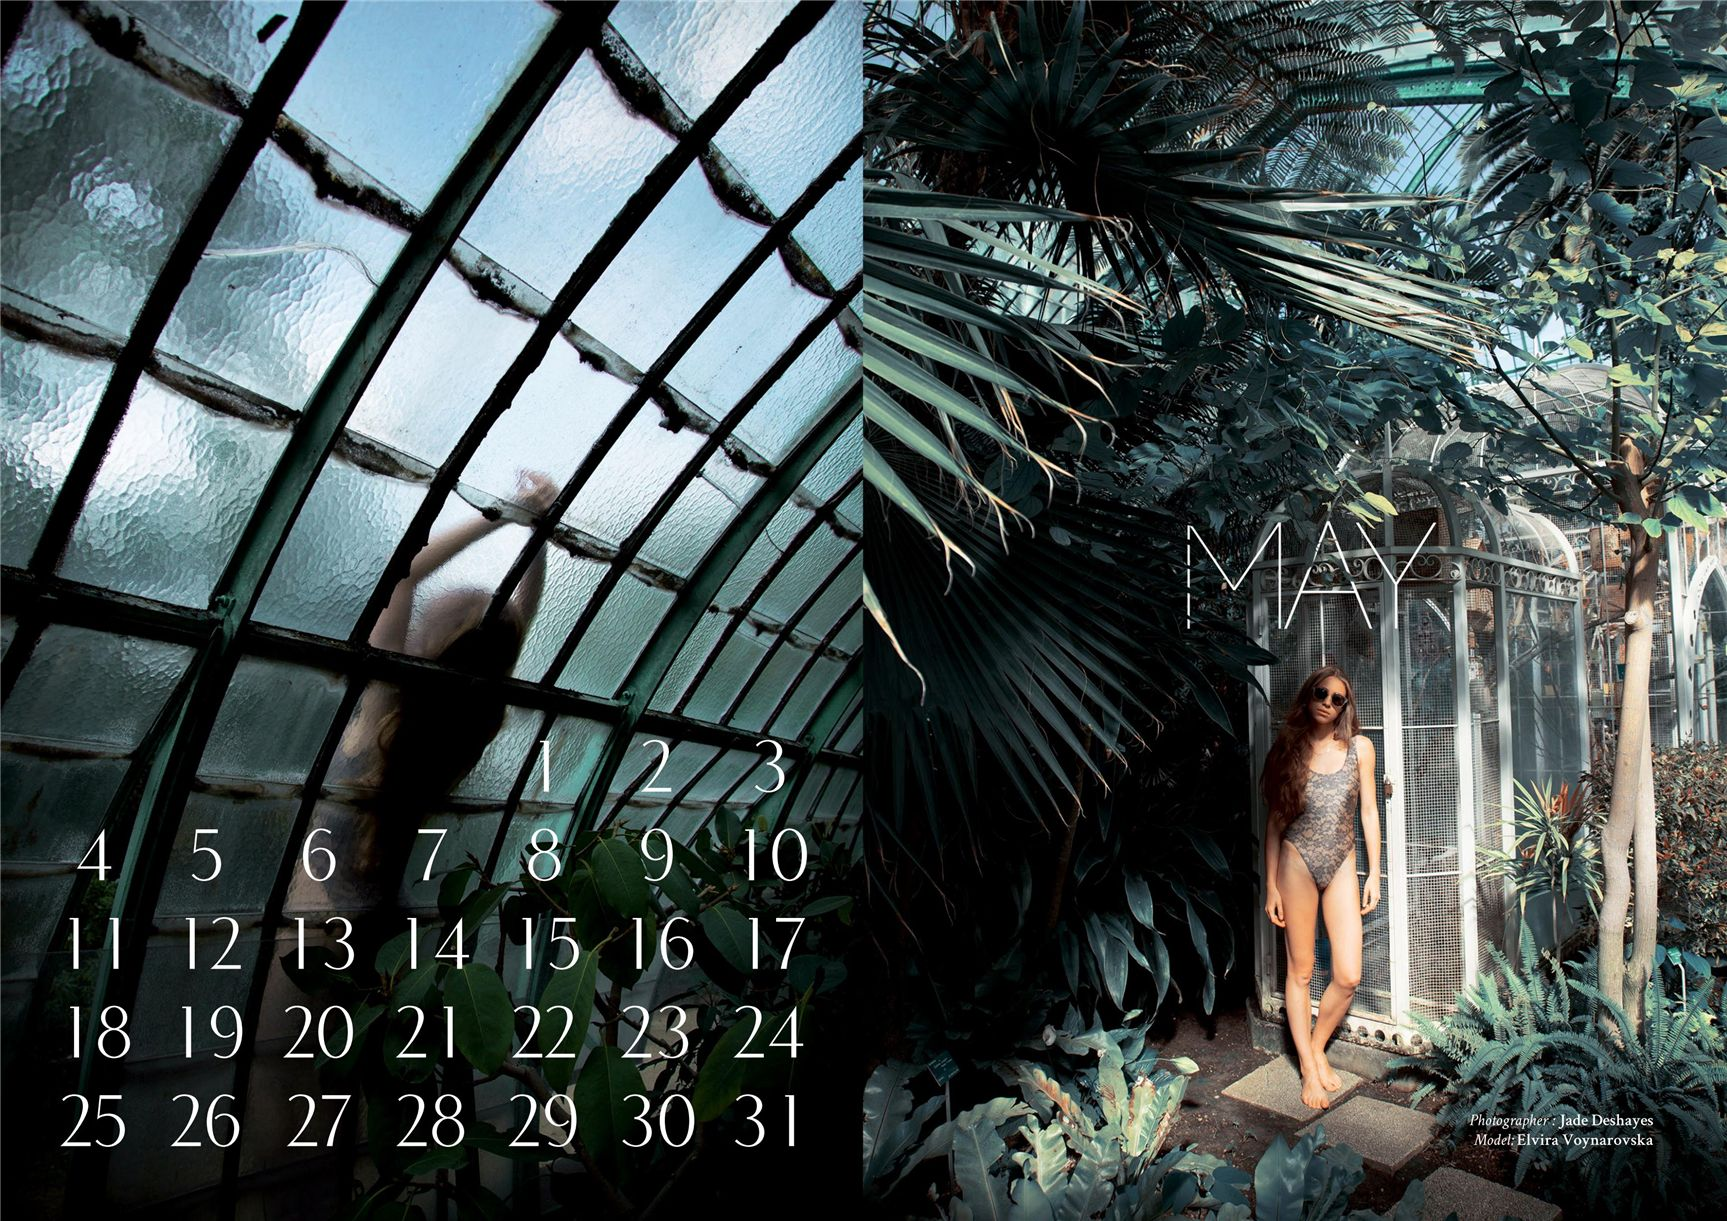 модно-артистический календарь журнала Bizart 2015 calendar - Elvira Voynarovska by Jade Deshayes